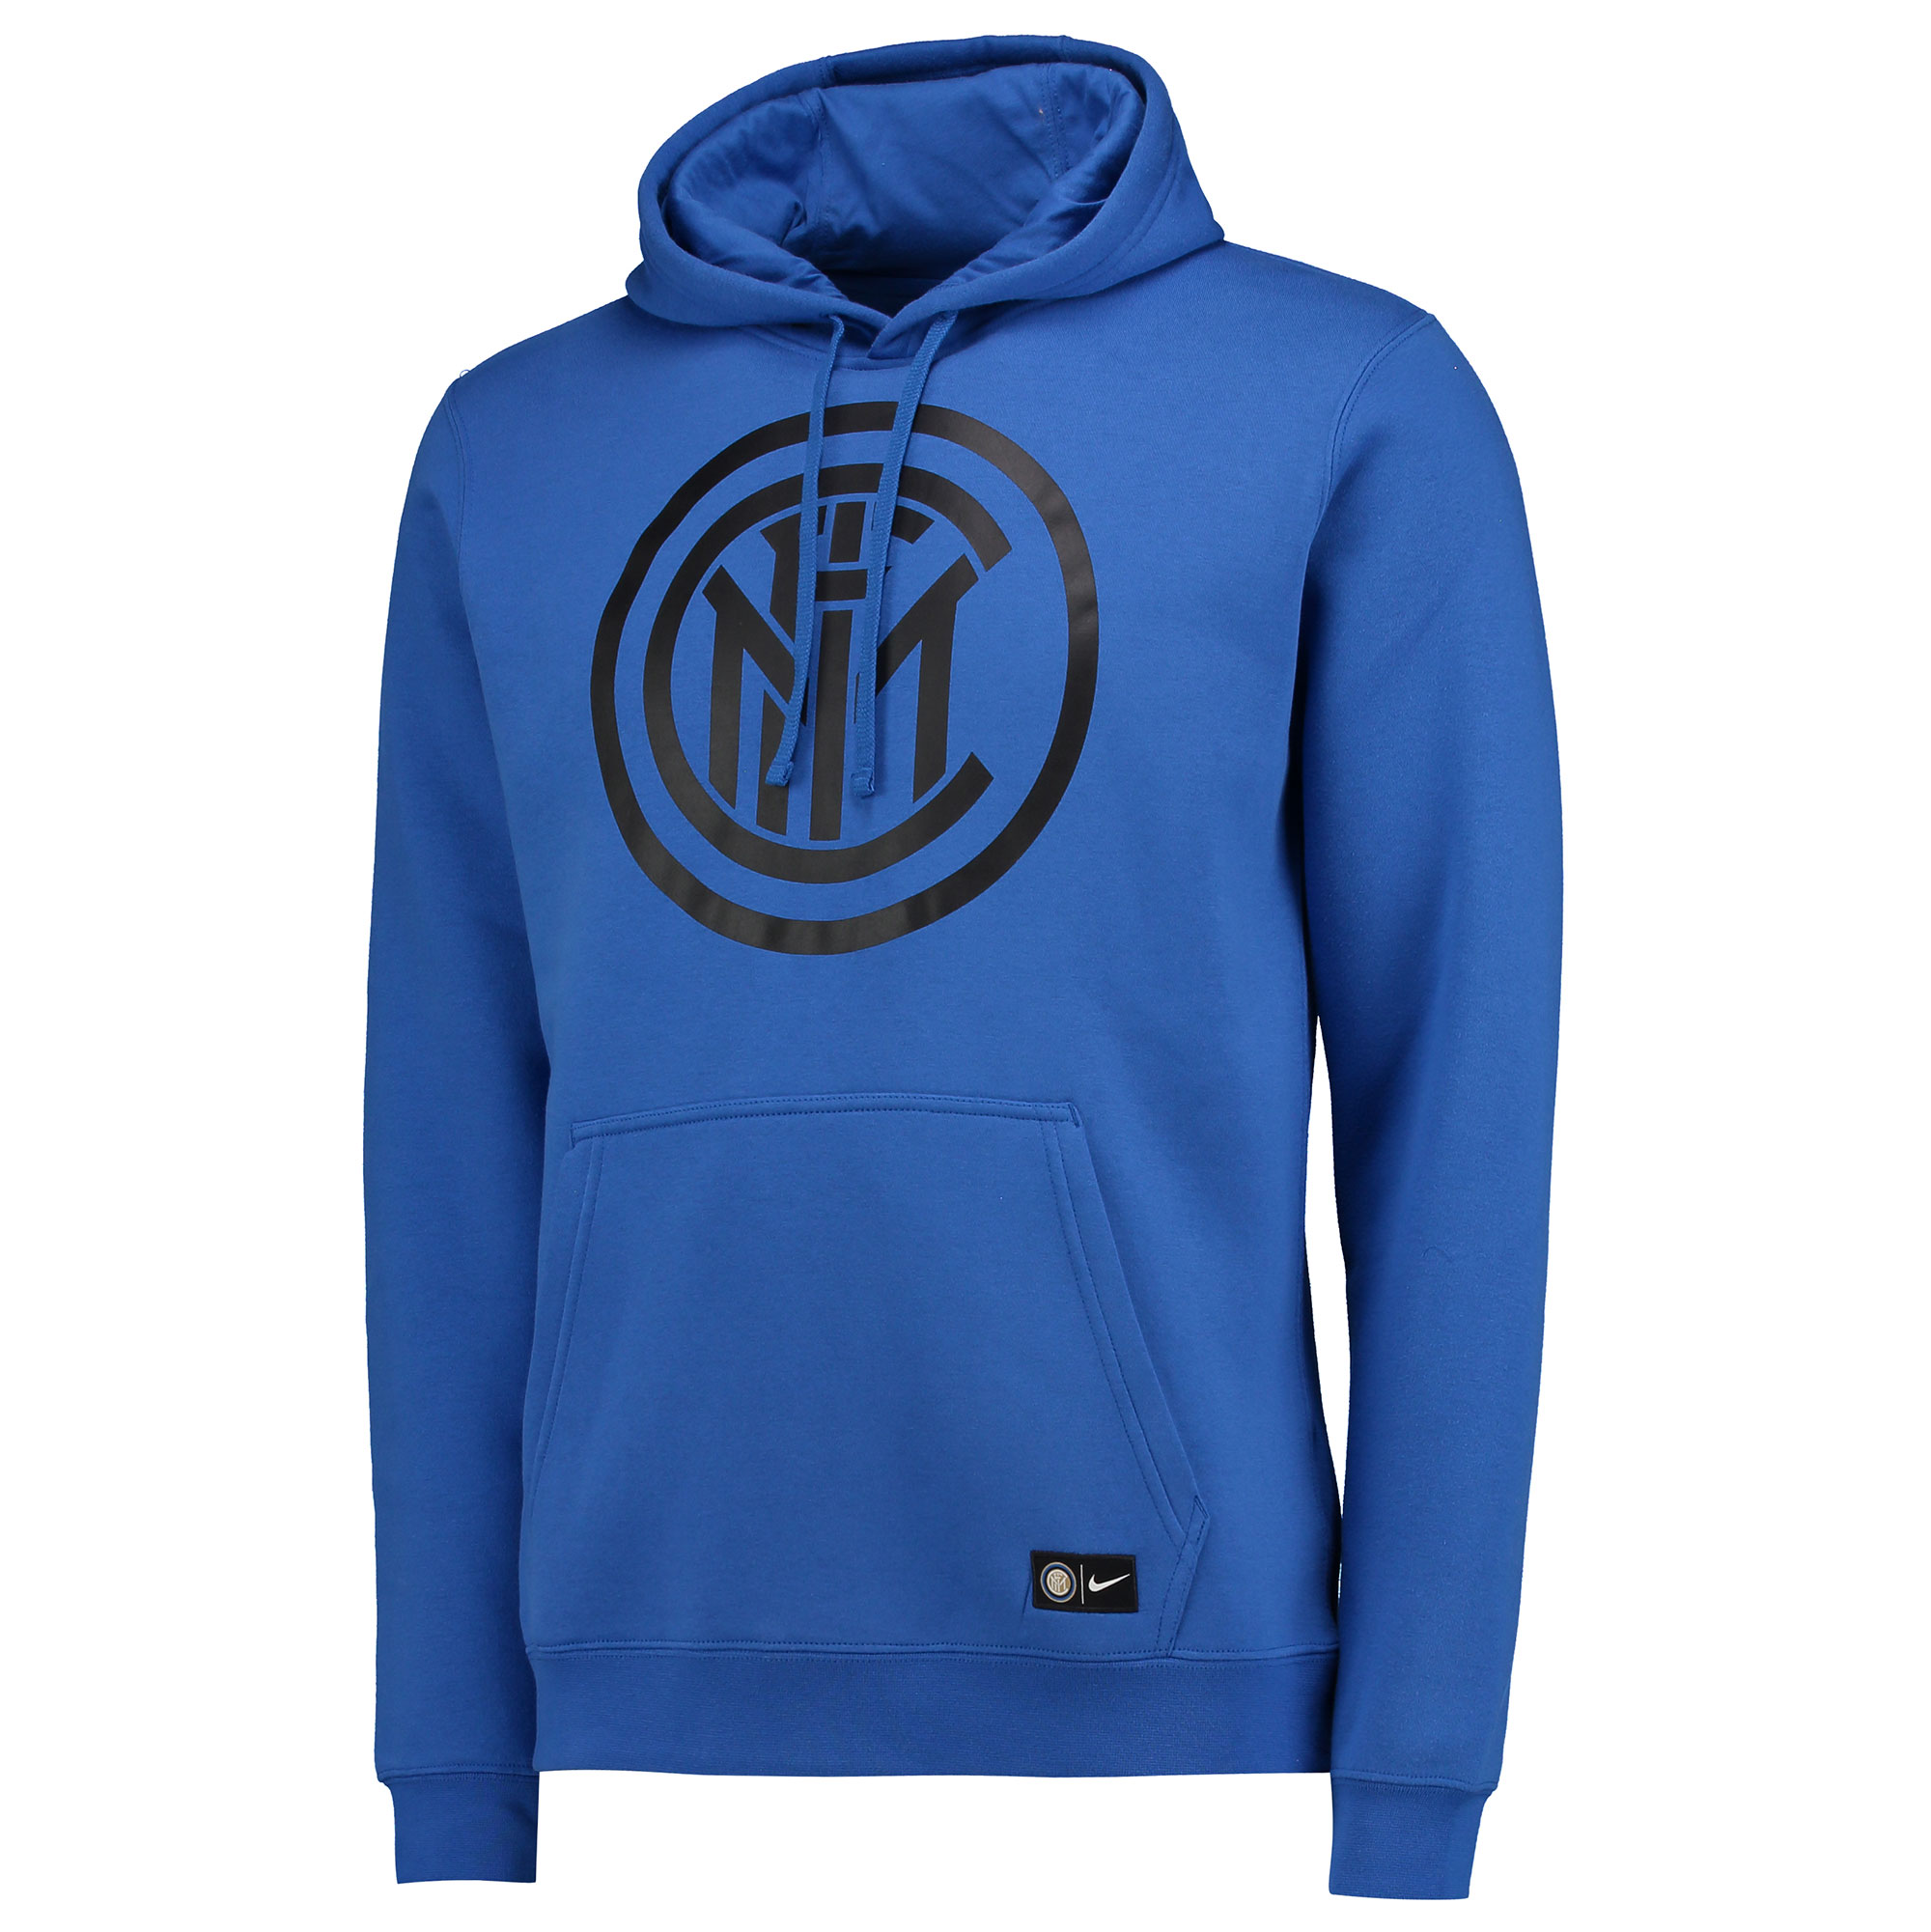 6cdc2c99054 Nike Inter Miláno (Inter Milan) mikina pánska modrá - SKLADOM